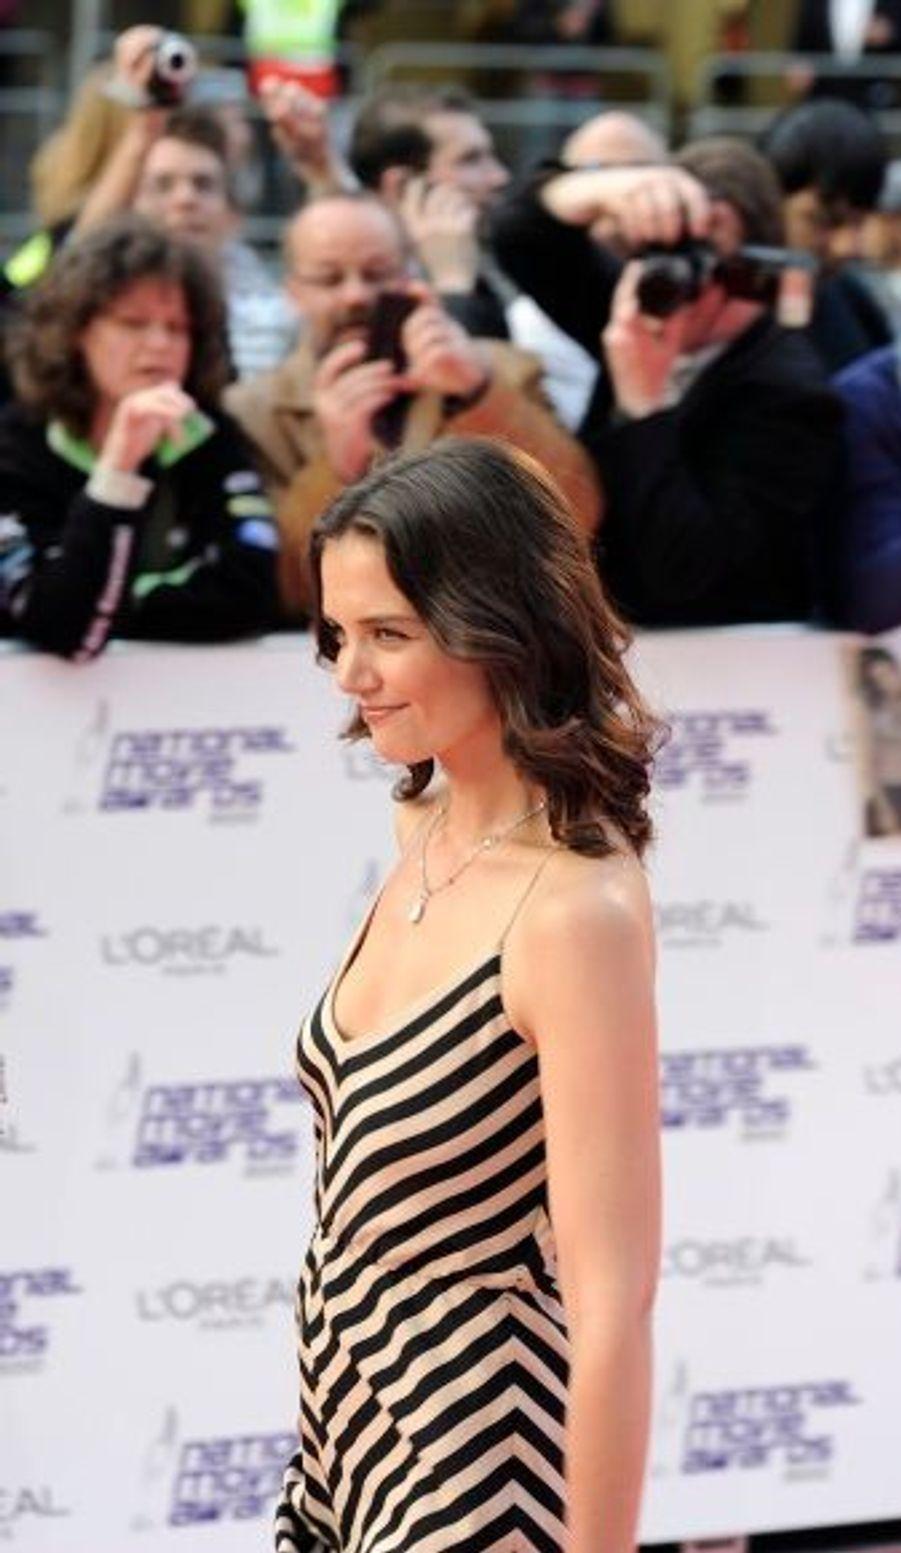 Katie Holmes, venue accompagner son mari Tom Cruise, portait une robe de sa propre collection, Holmes&Yang.